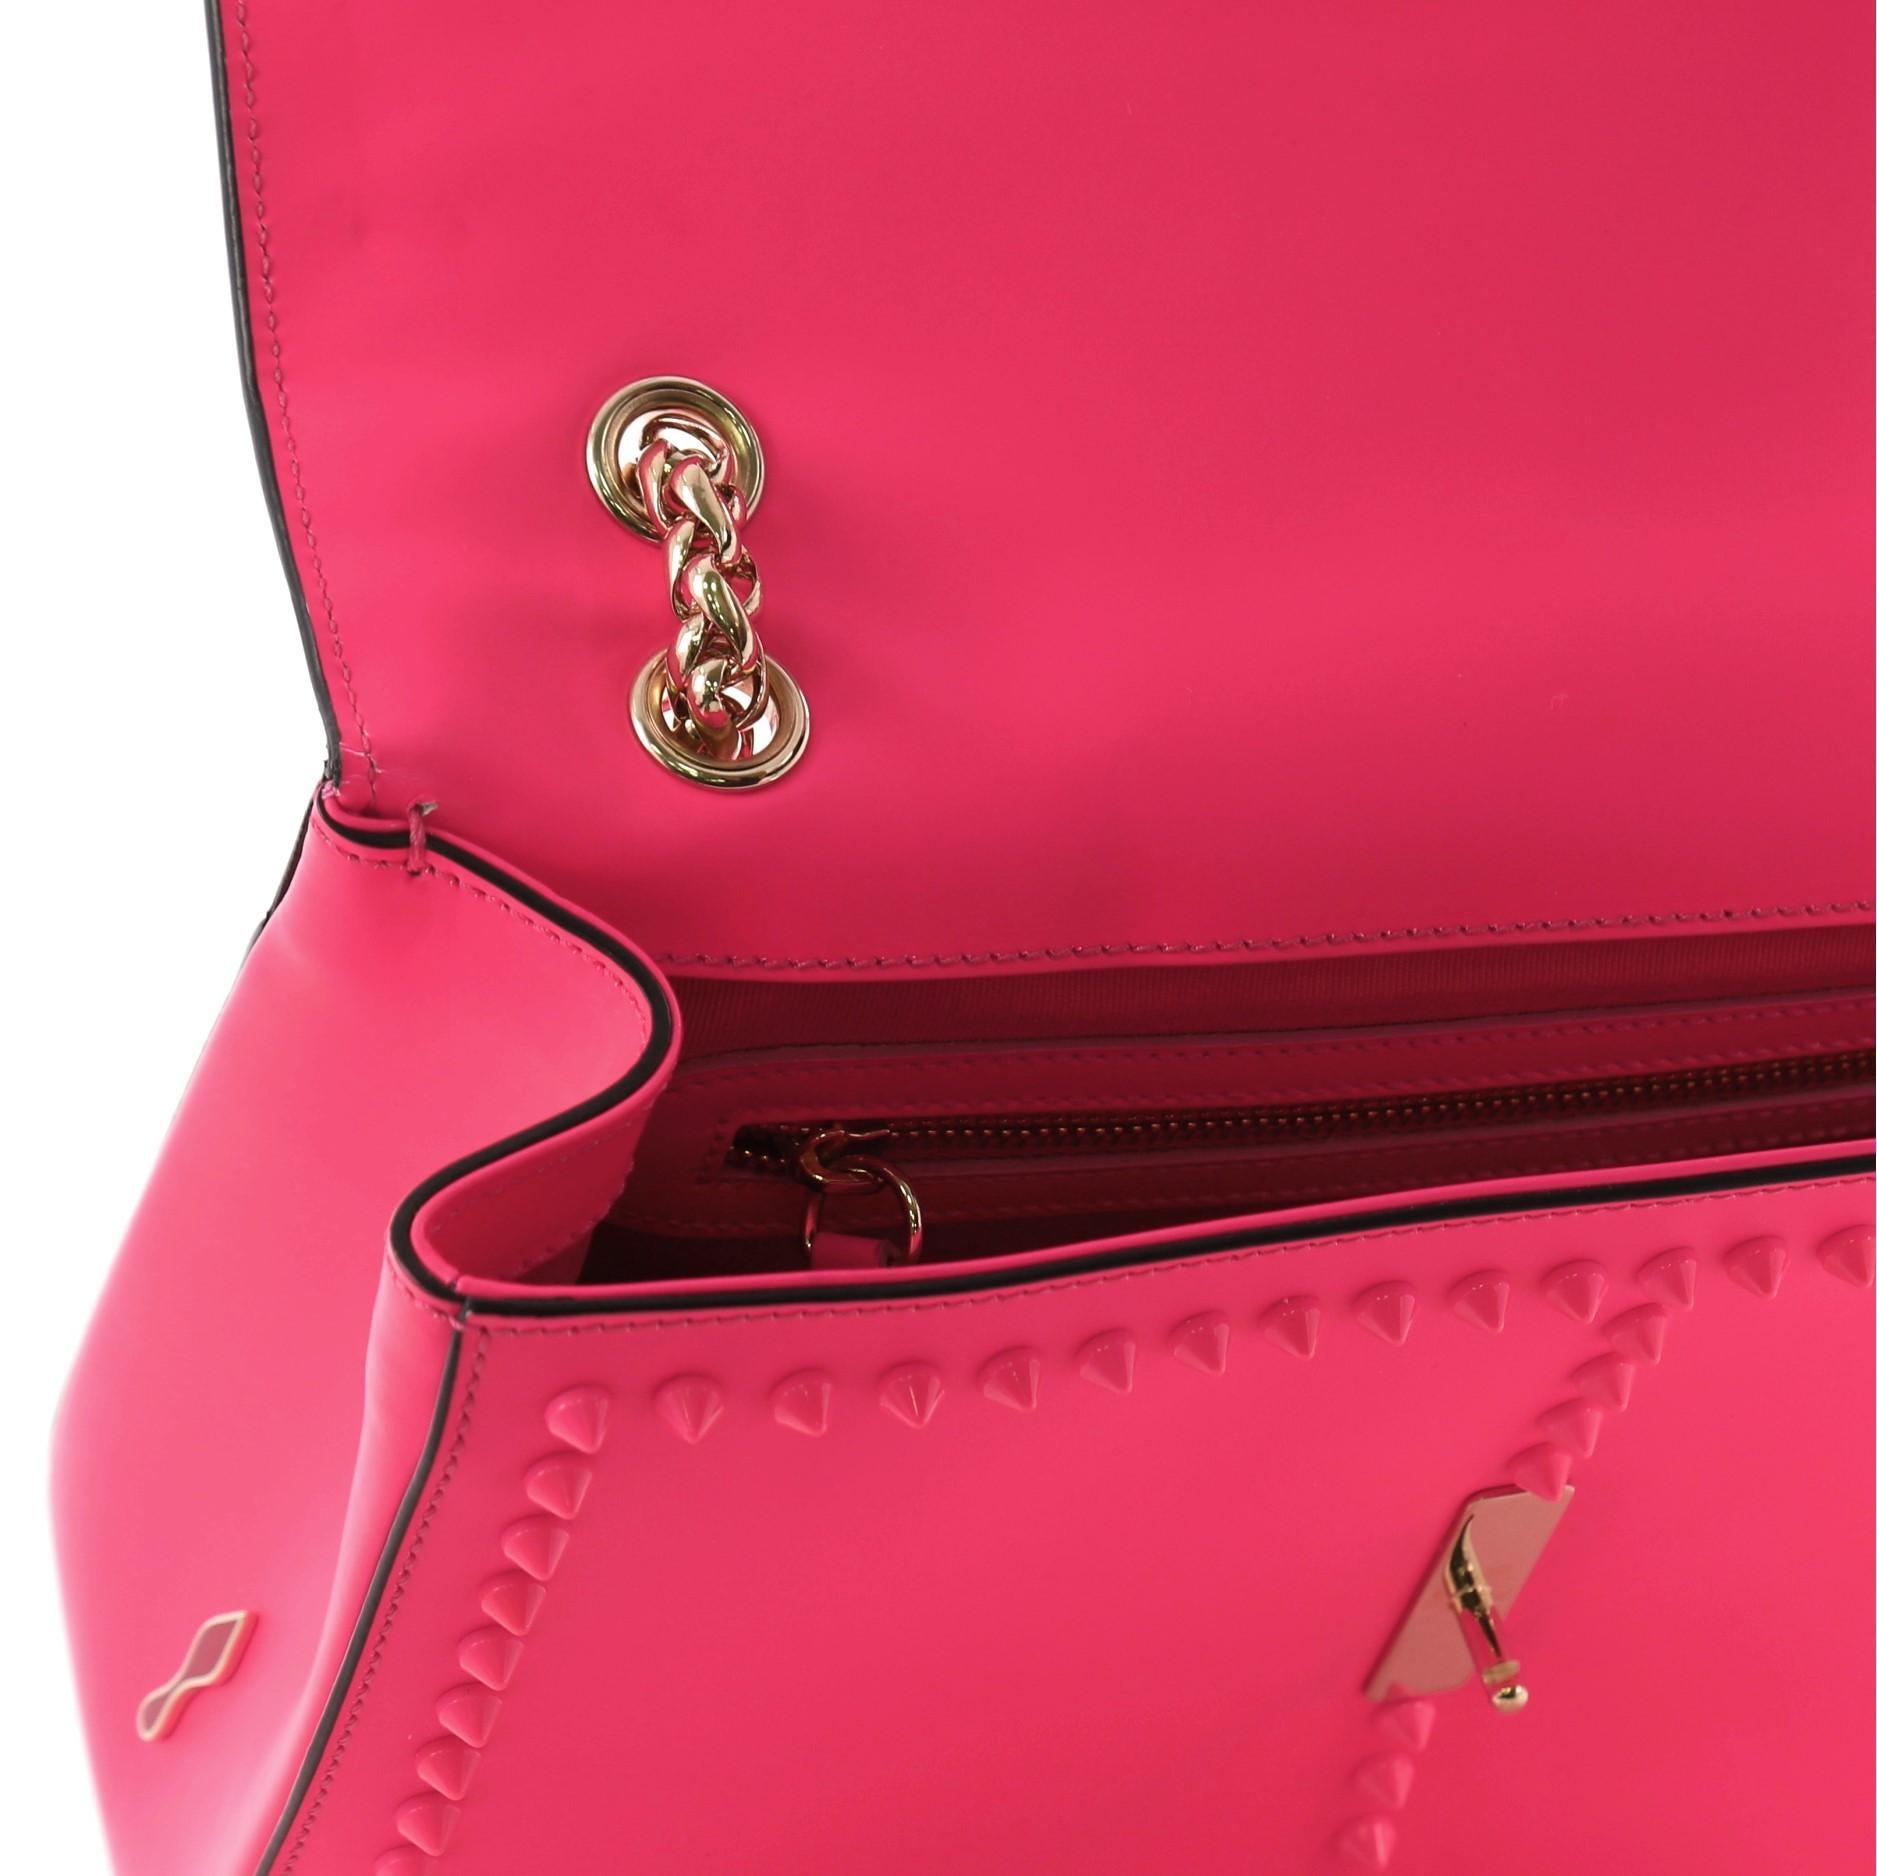 d826f224139 Christian Louboutin Sweet Charity Crossbody Bag Leather Medium